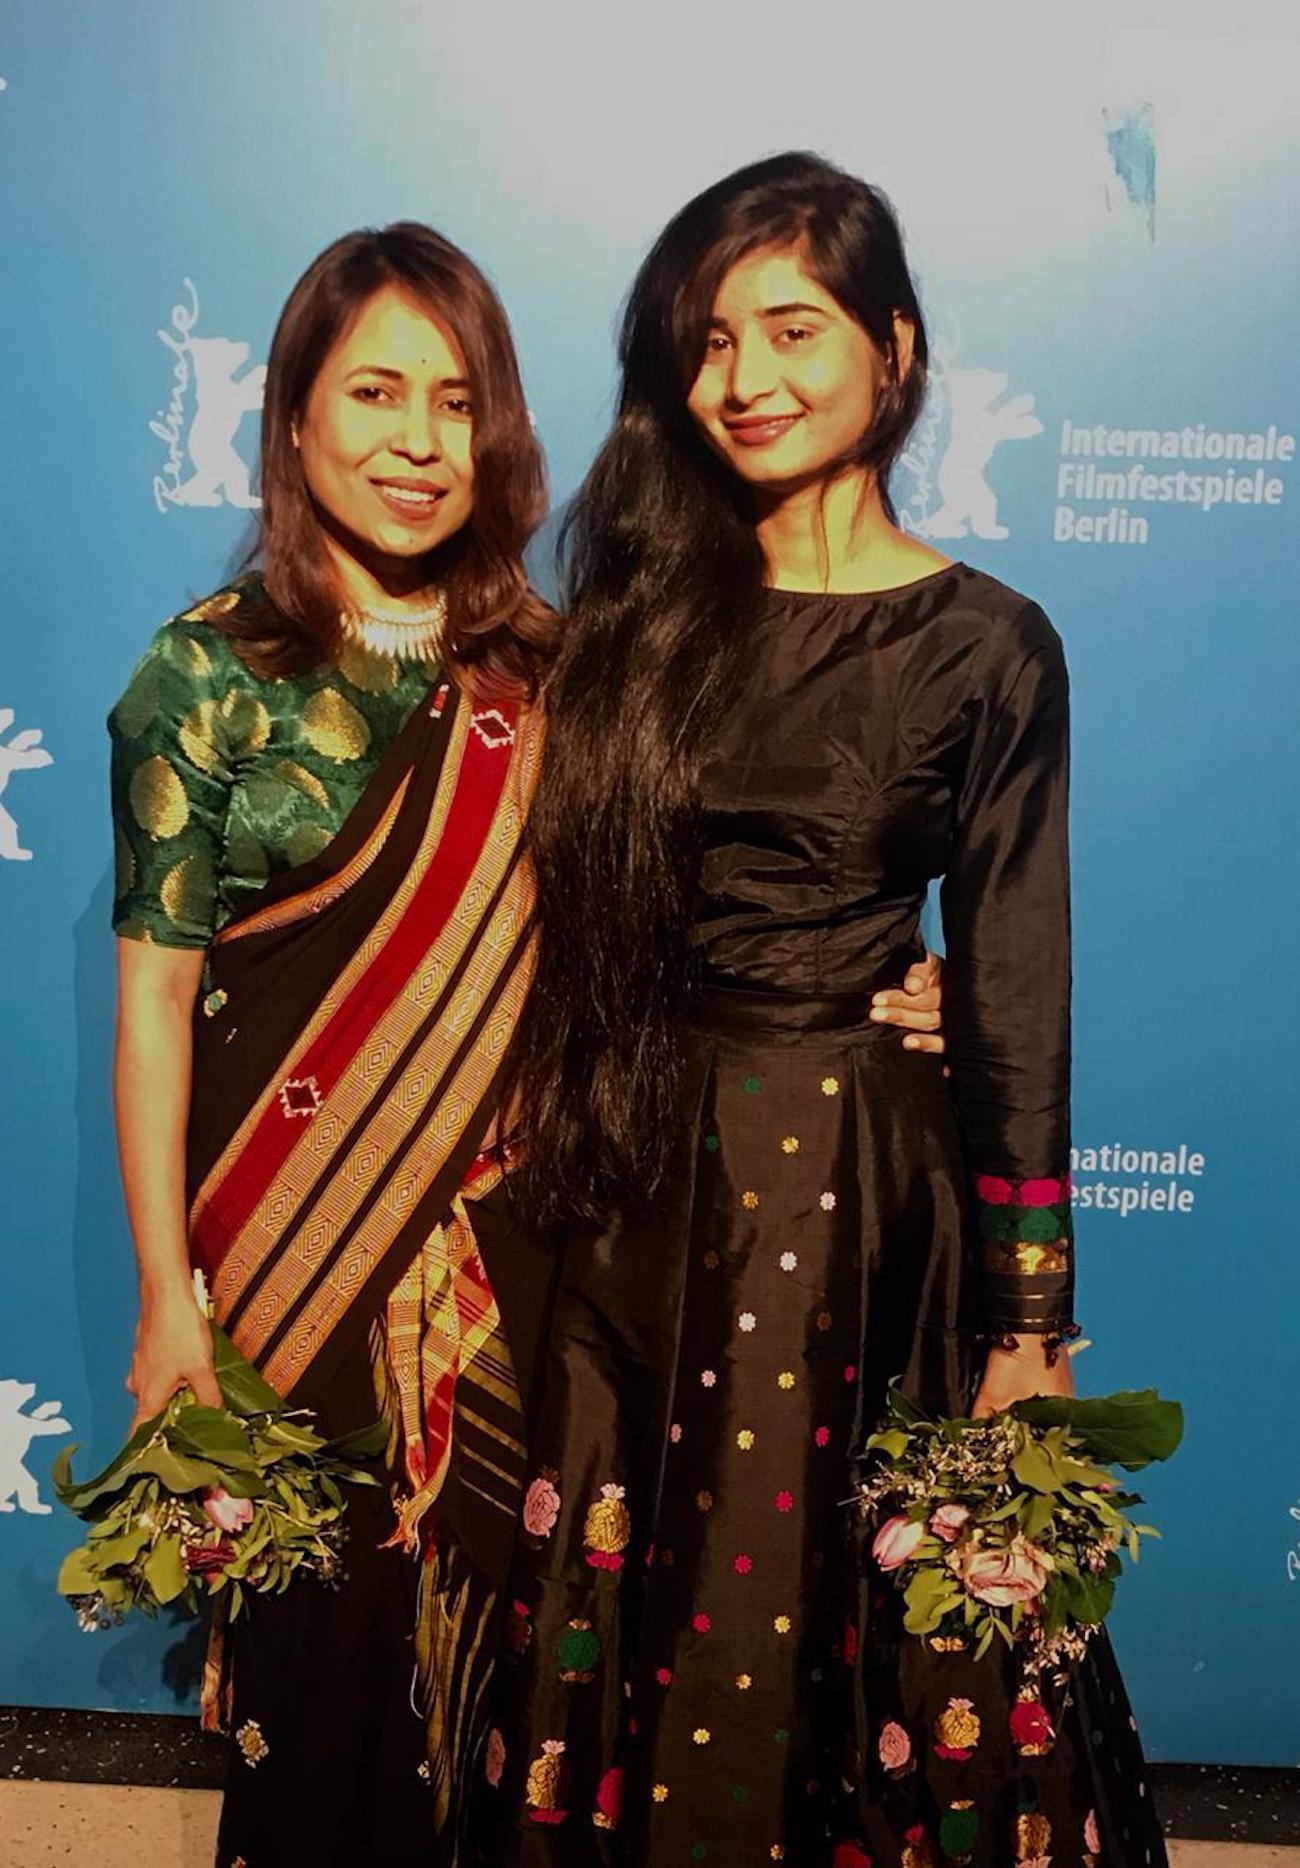 BWW Feature: RIMA DAS DIRECTED BULBUL CAN SING  Wins At Berlin International Film Festival